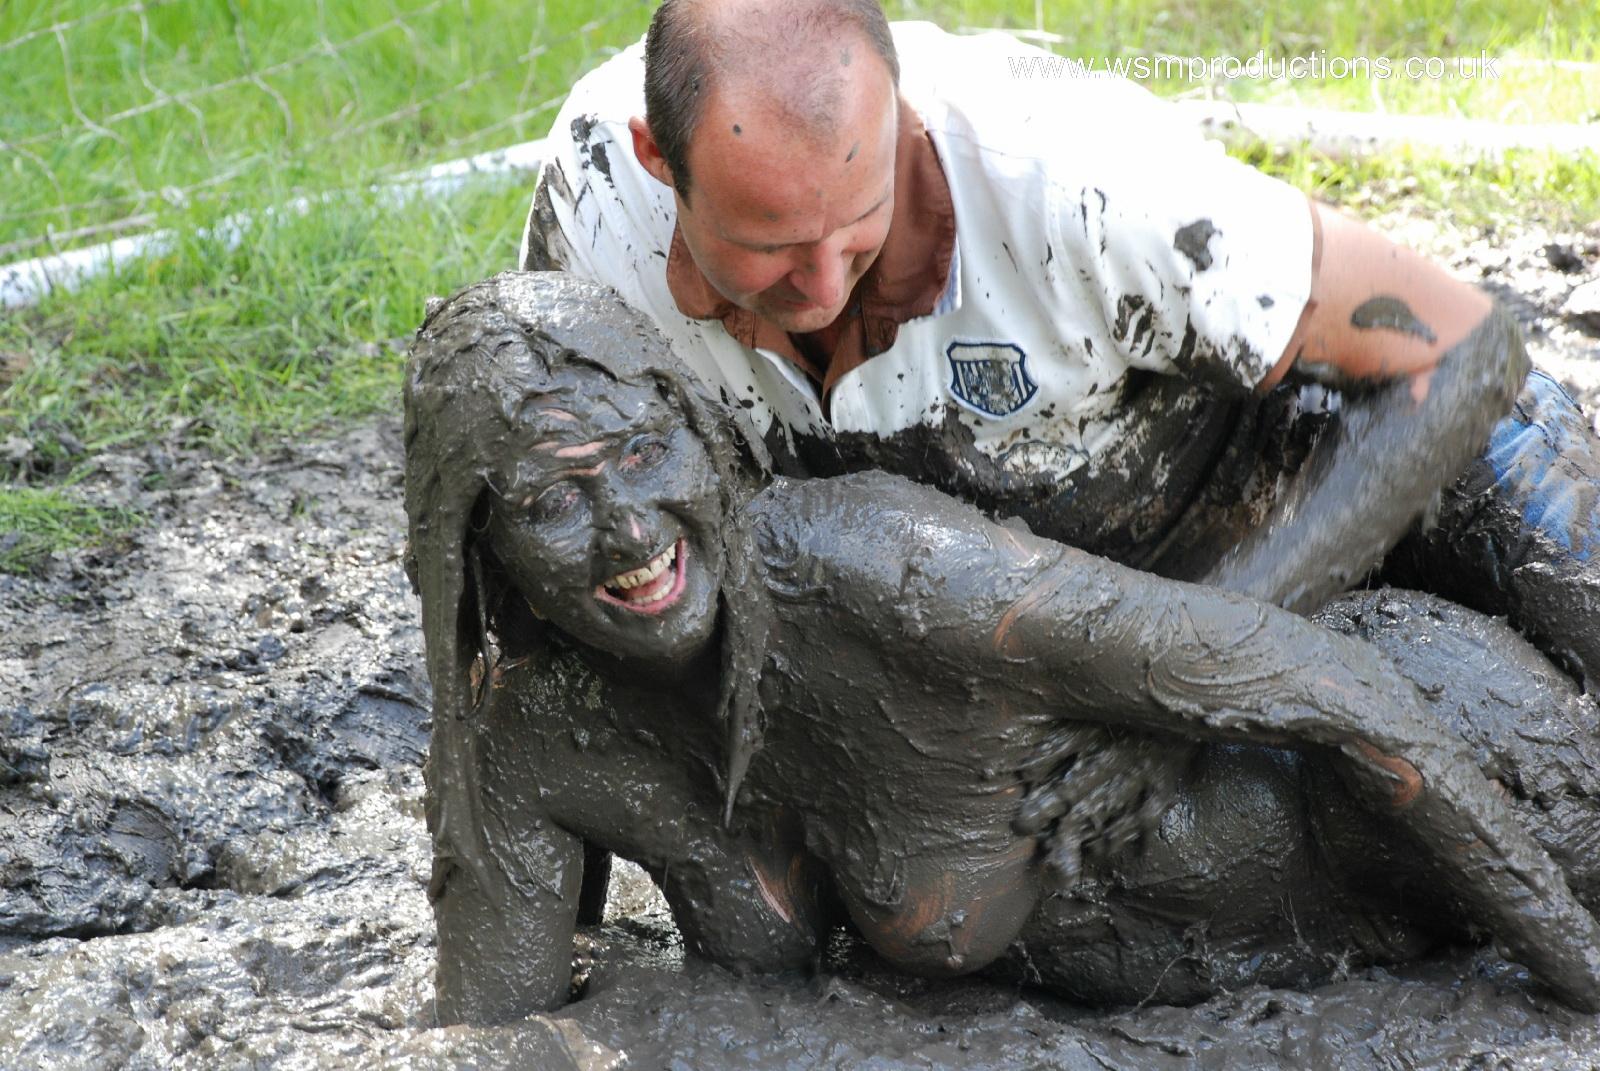 Русский секс в грязи, В грязи - бесплатное онлайн порно на сайте TopPorno 22 фотография